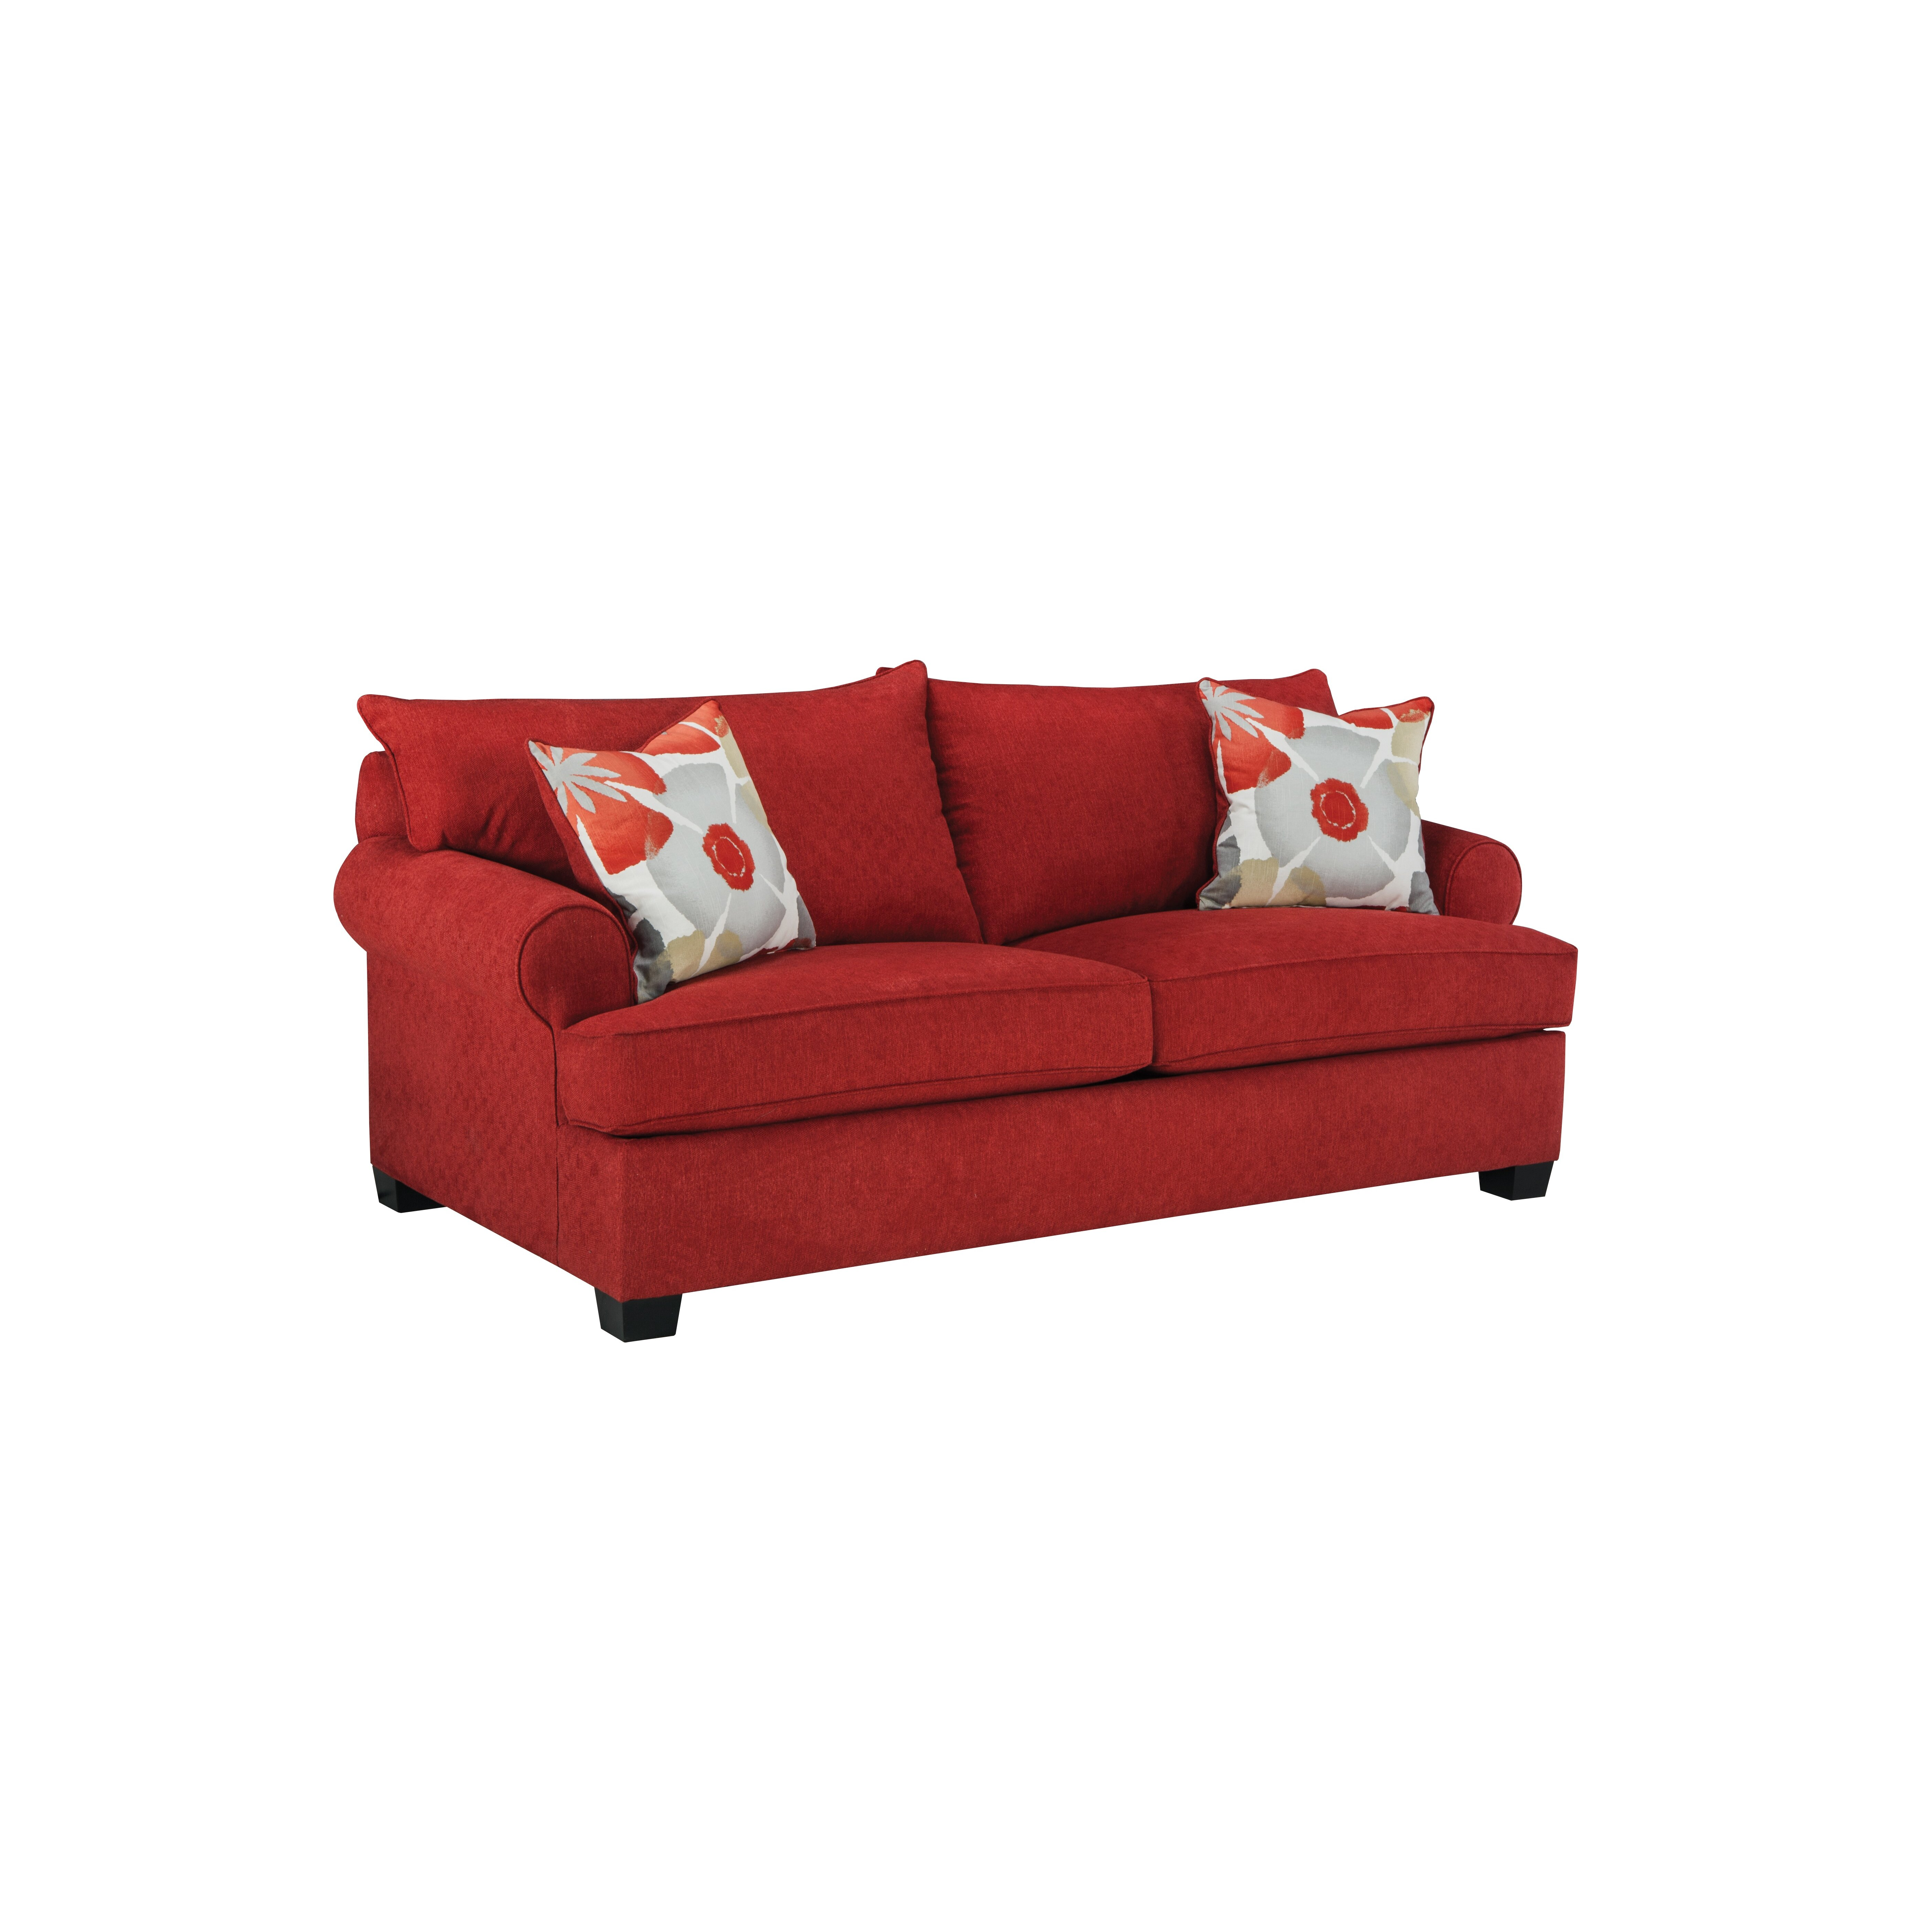 overnight sofa twin sleeper sofa. Black Bedroom Furniture Sets. Home Design Ideas